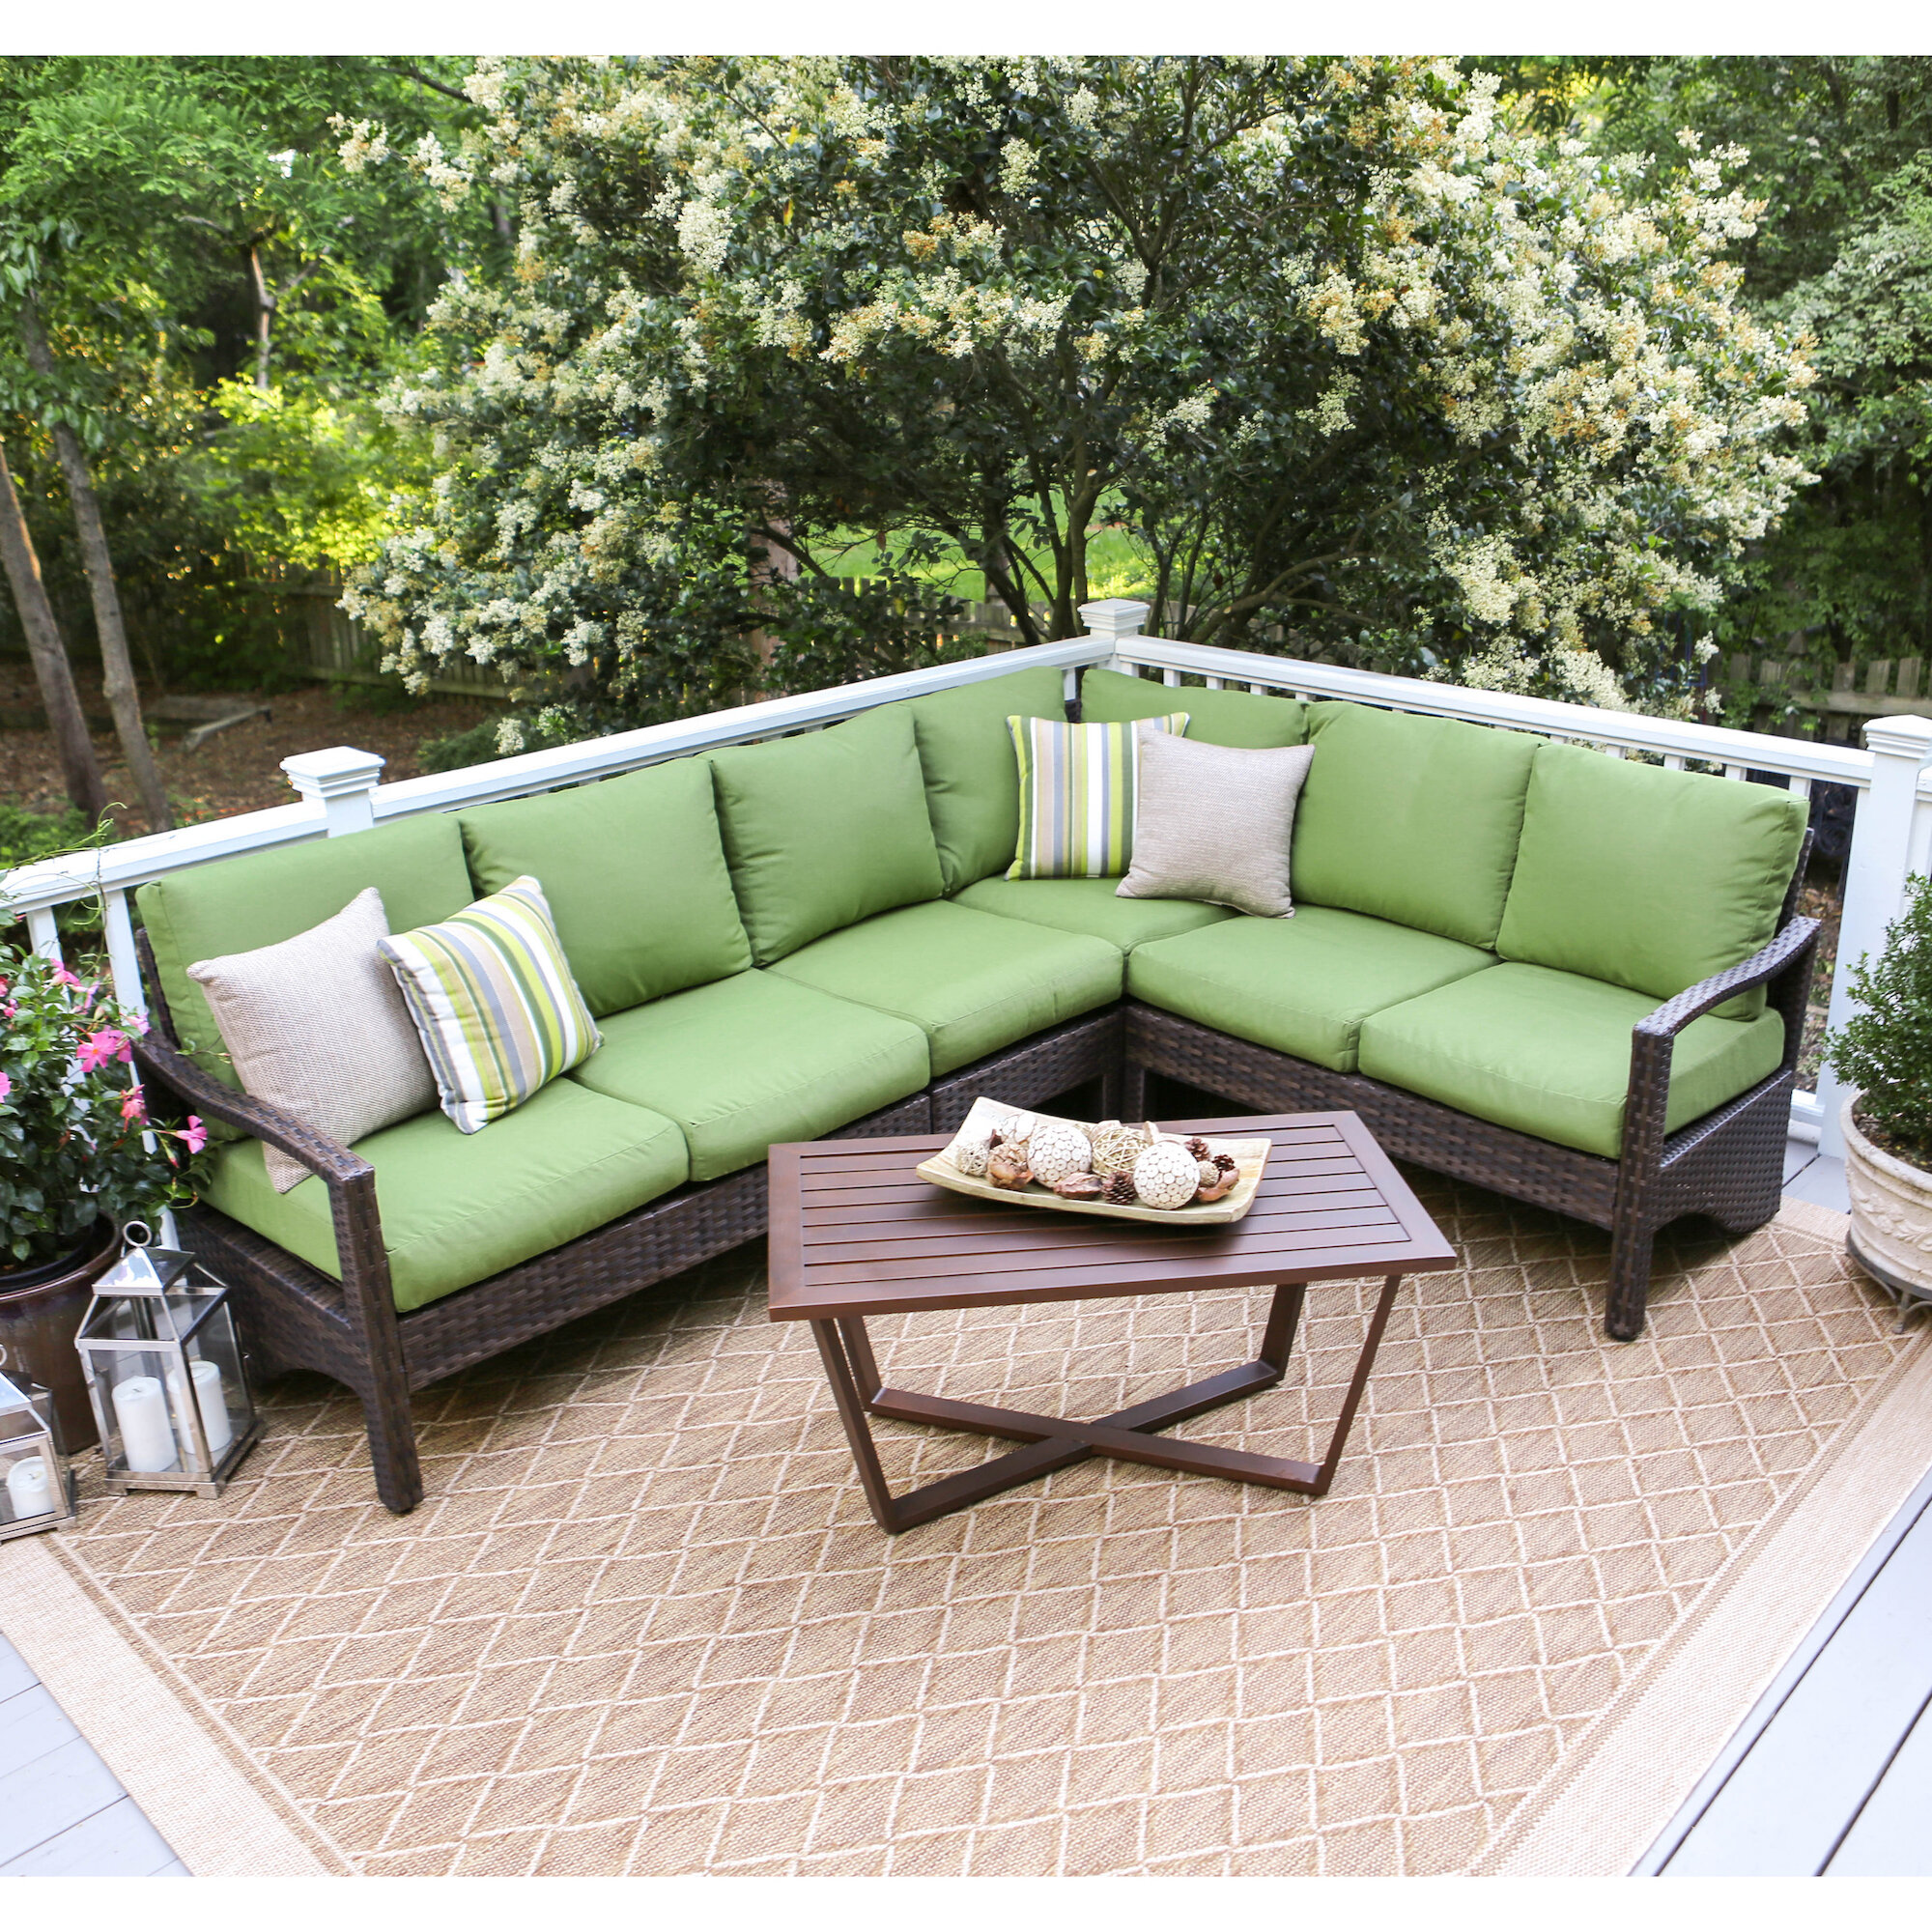 Sunbrella Fabric Included Outdoor Sofa Sets   Joss & Main